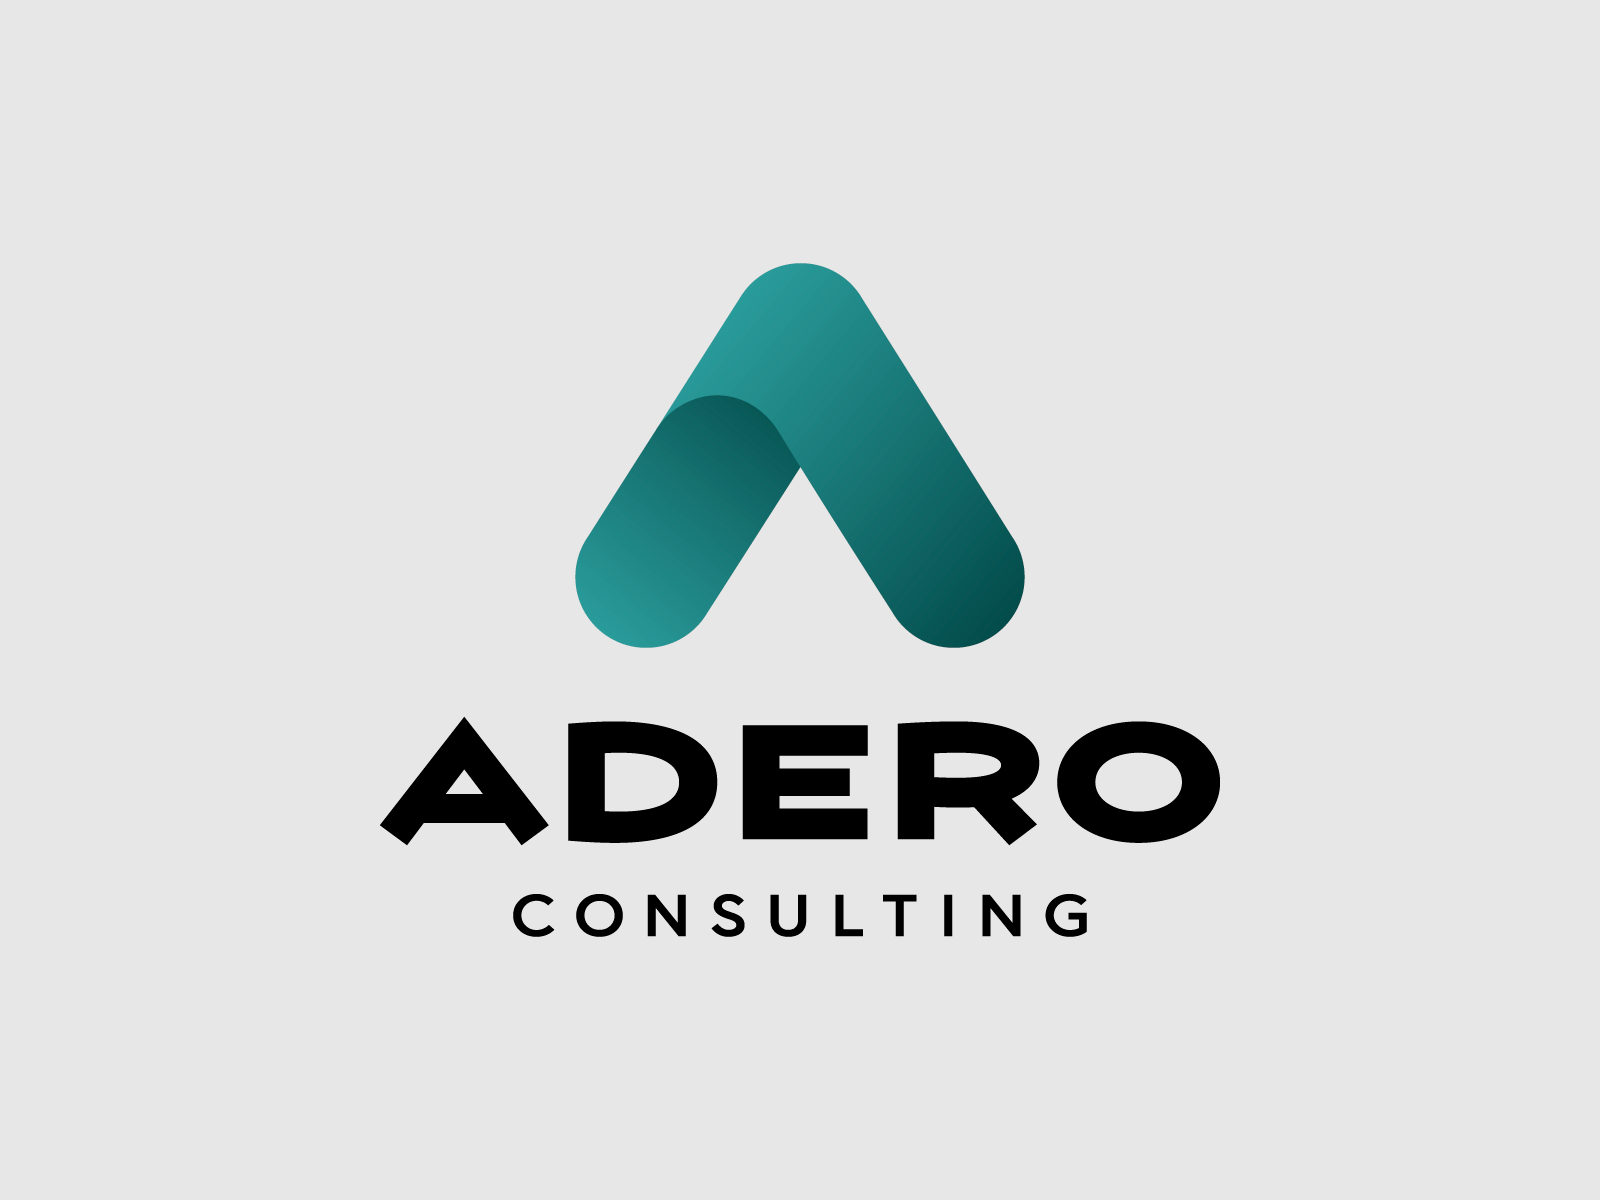 Adero Consulting logo